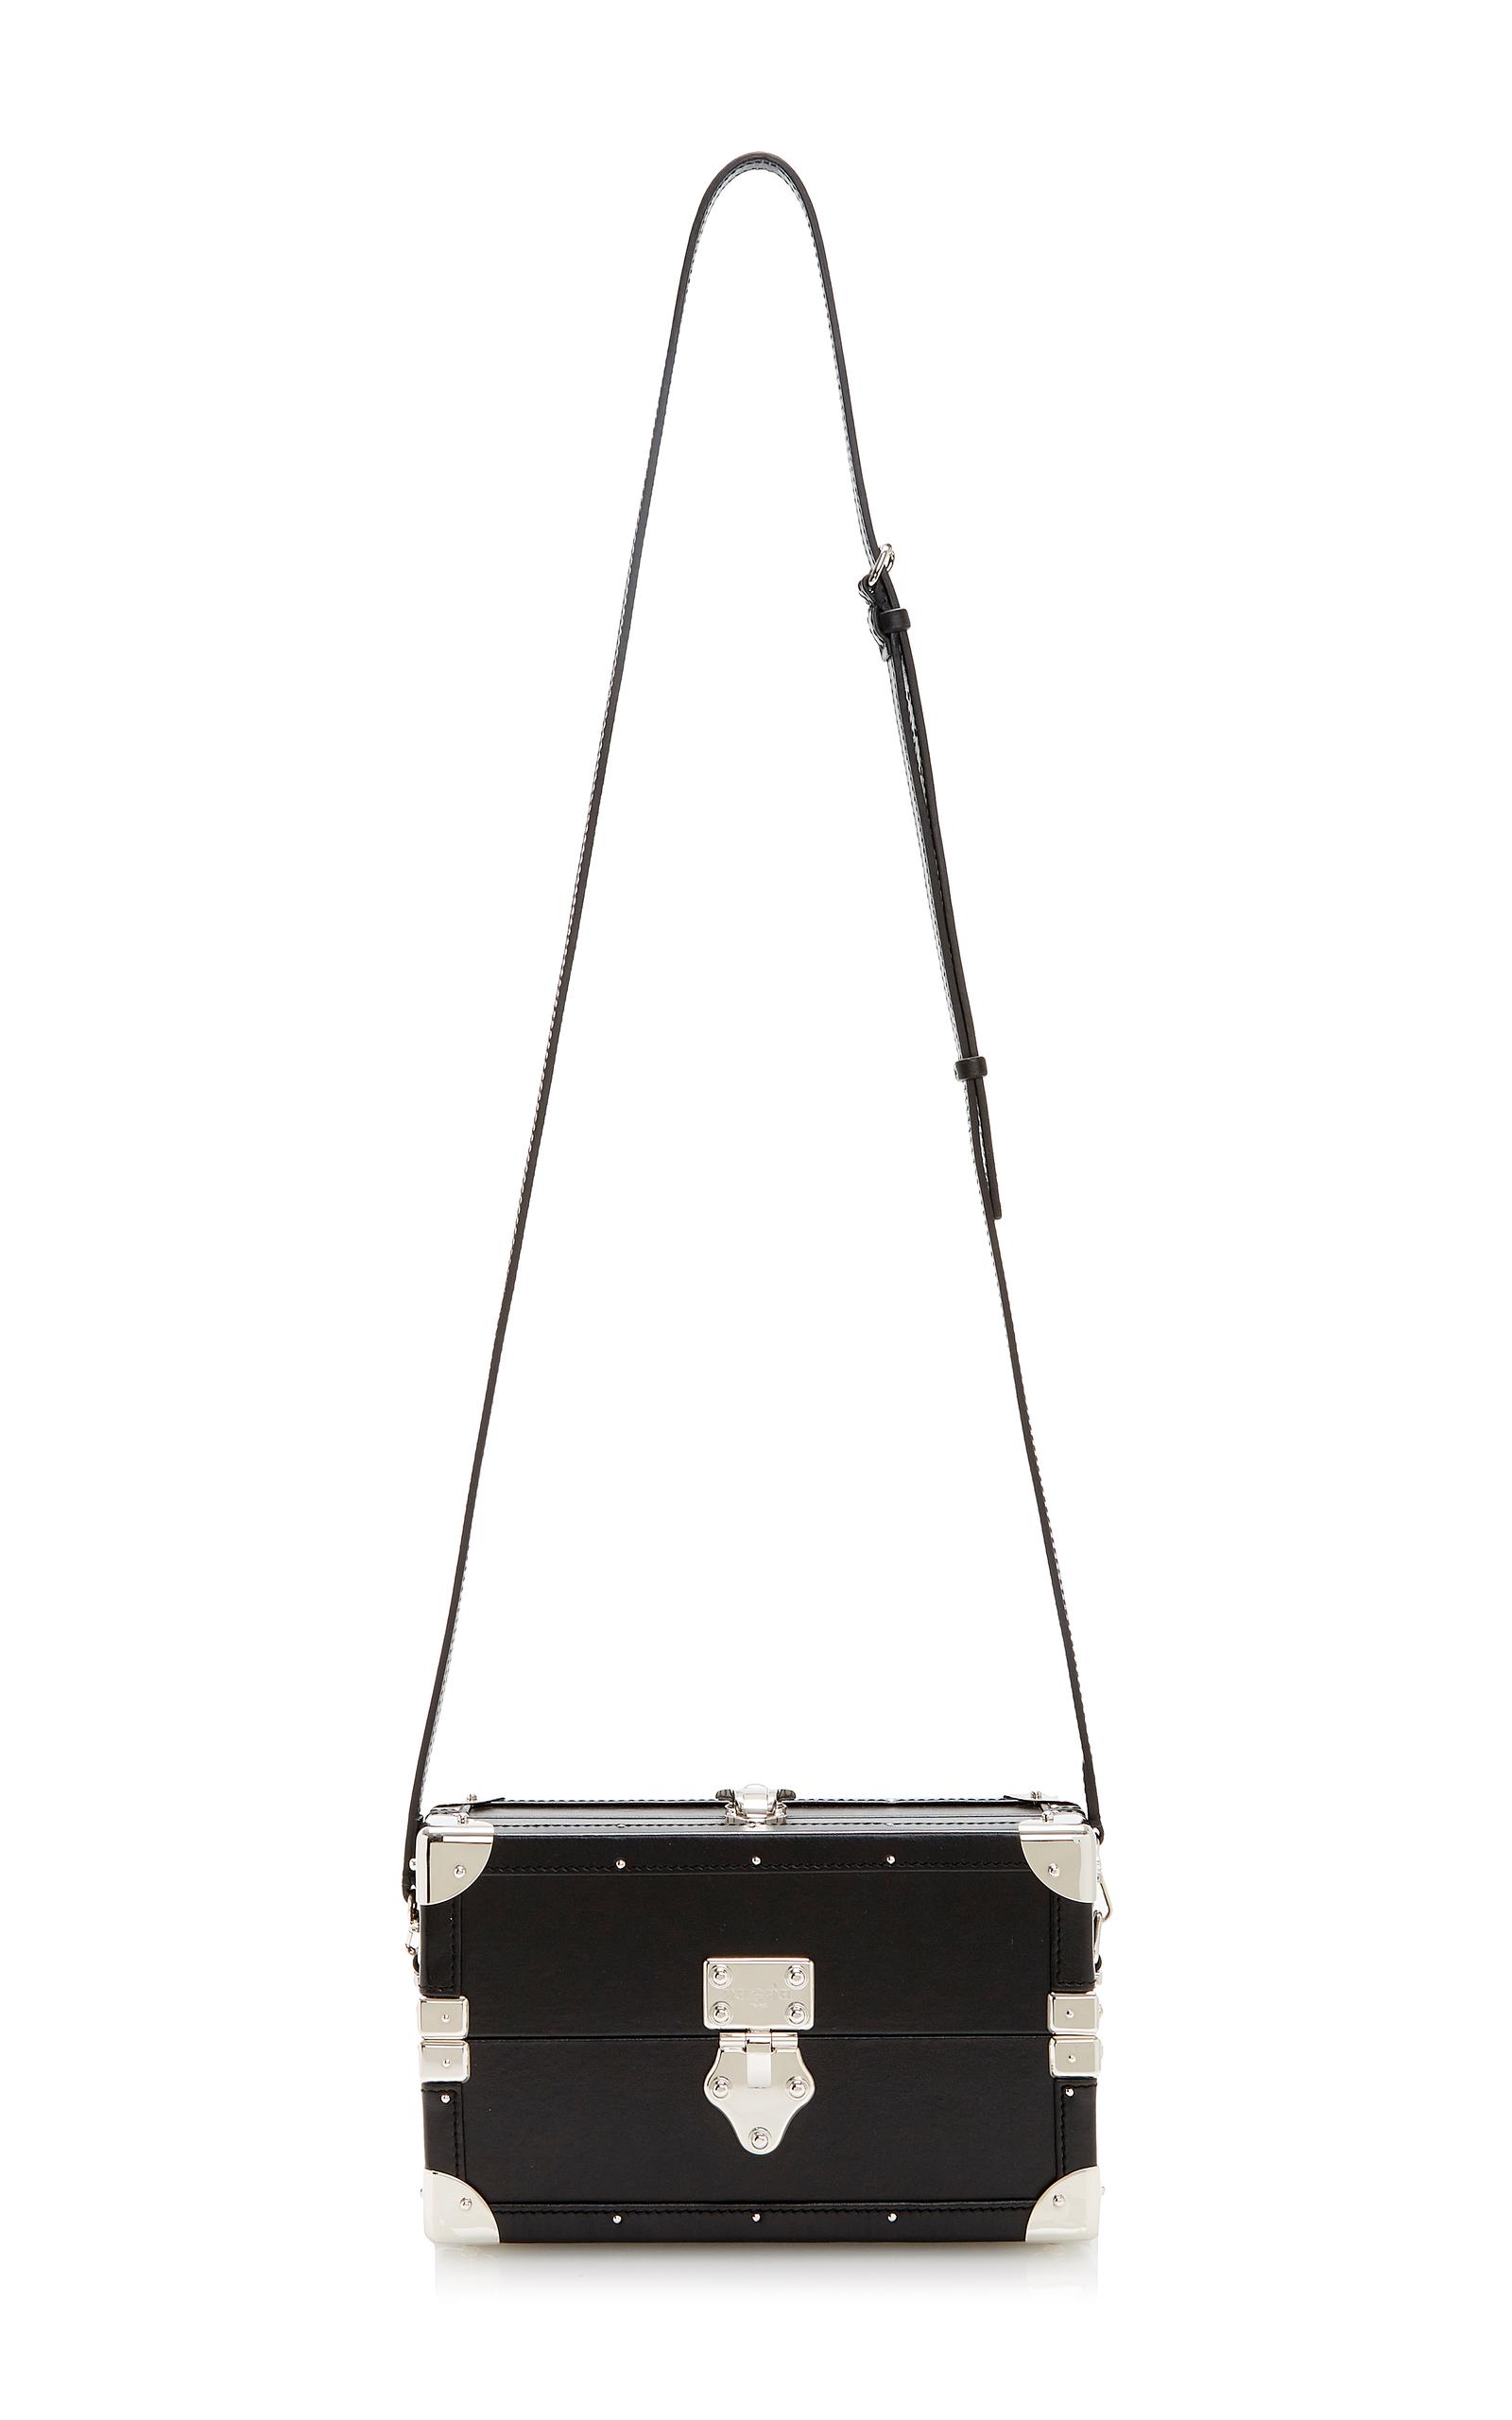 Elizabeth Bags Lusyani Tote Black Spec Dan Daftar Harga Terbaru Bag Madeline Putih Home Molly Backpack Brickred Page 6 Forces